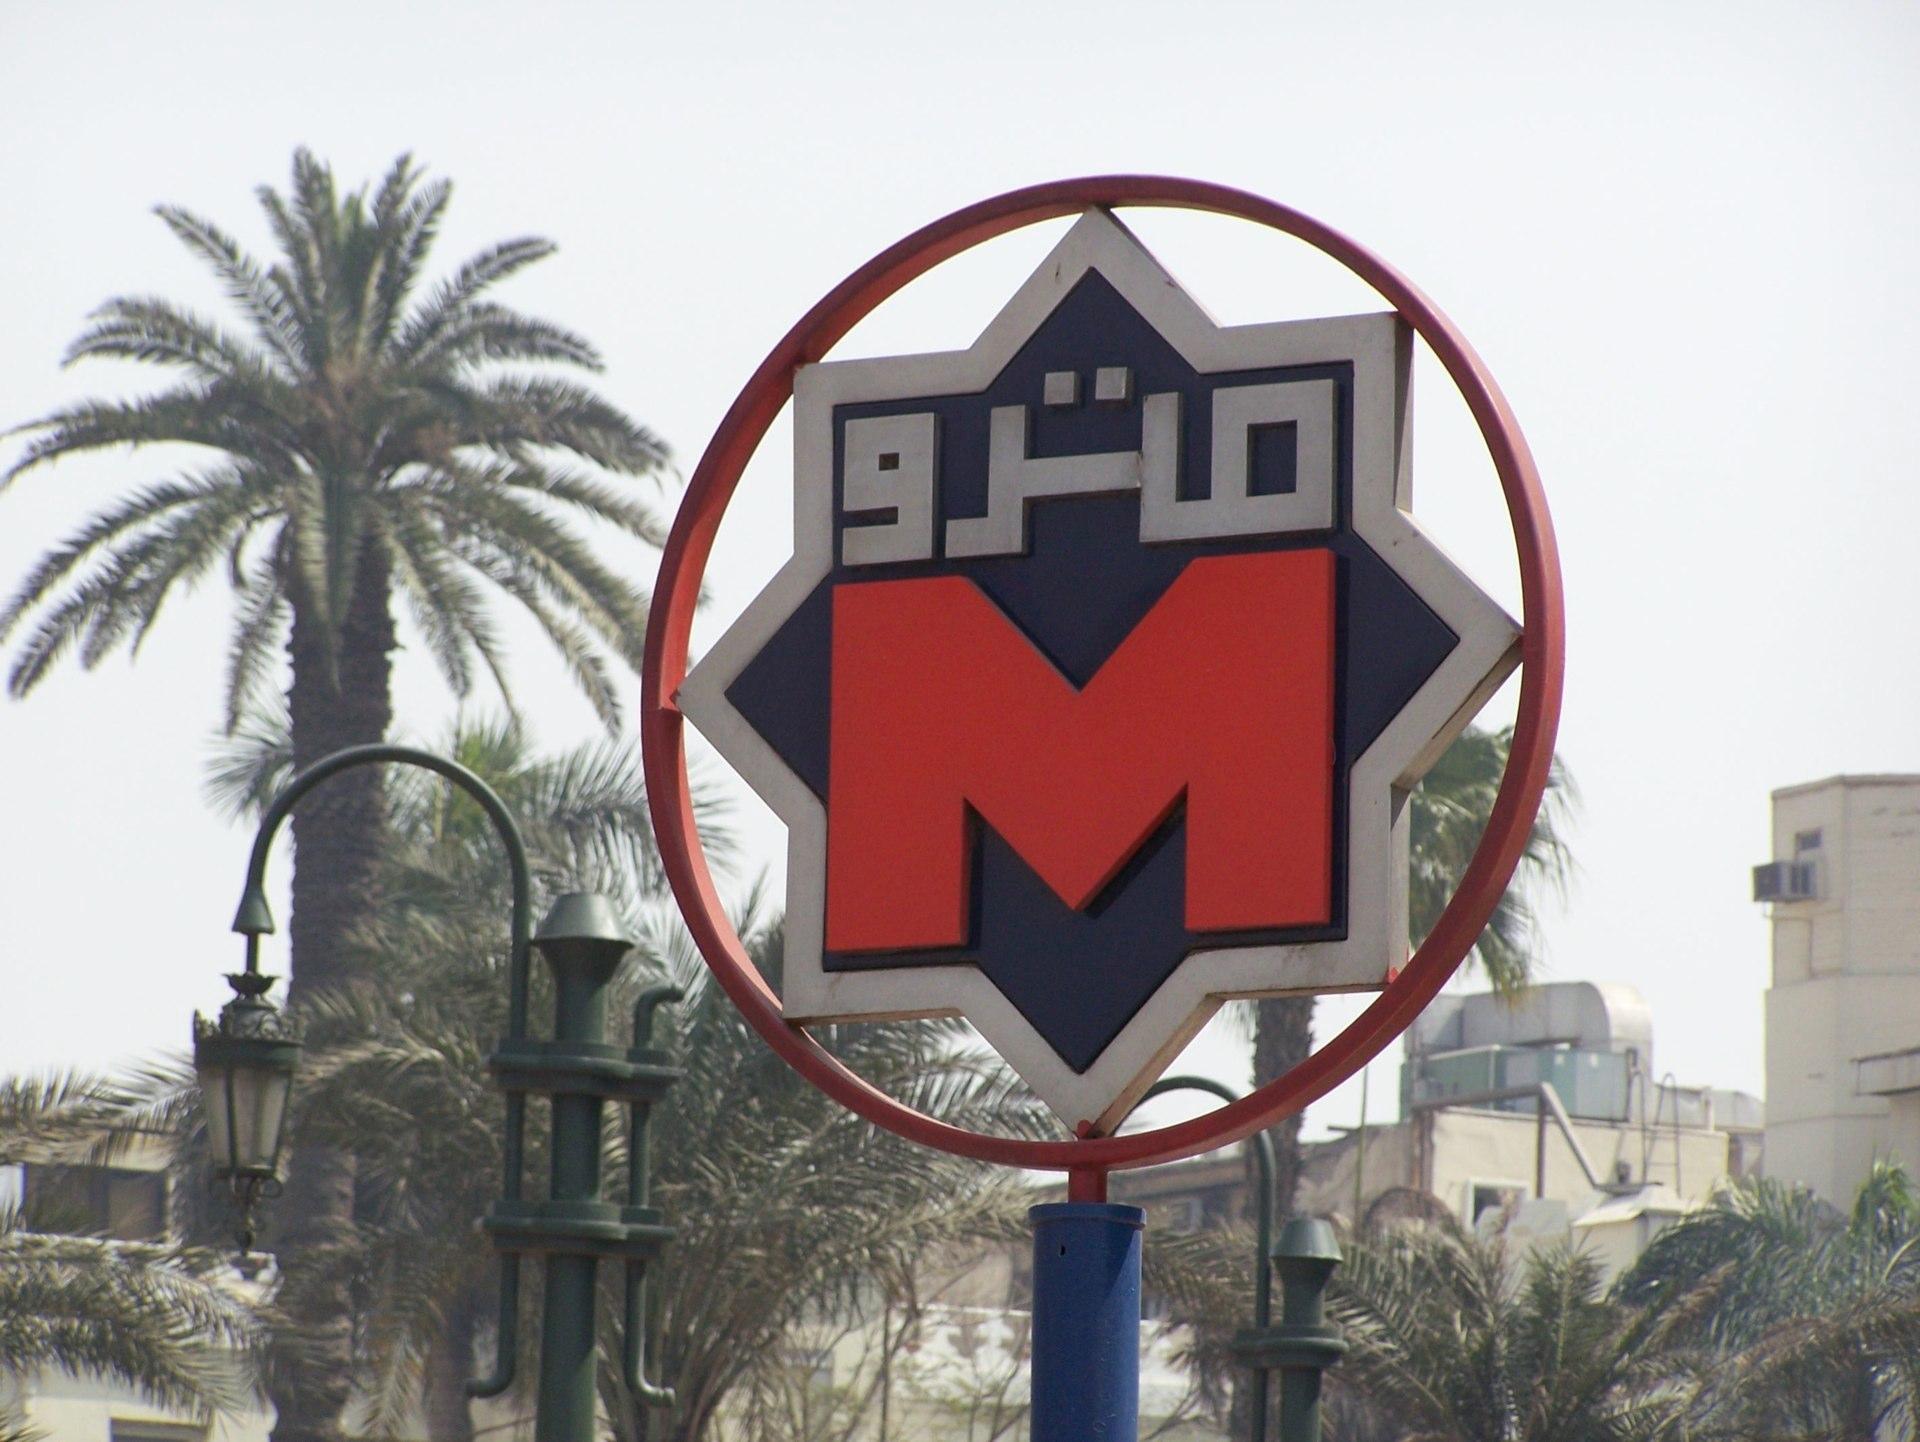 Metro Schild, Kairo